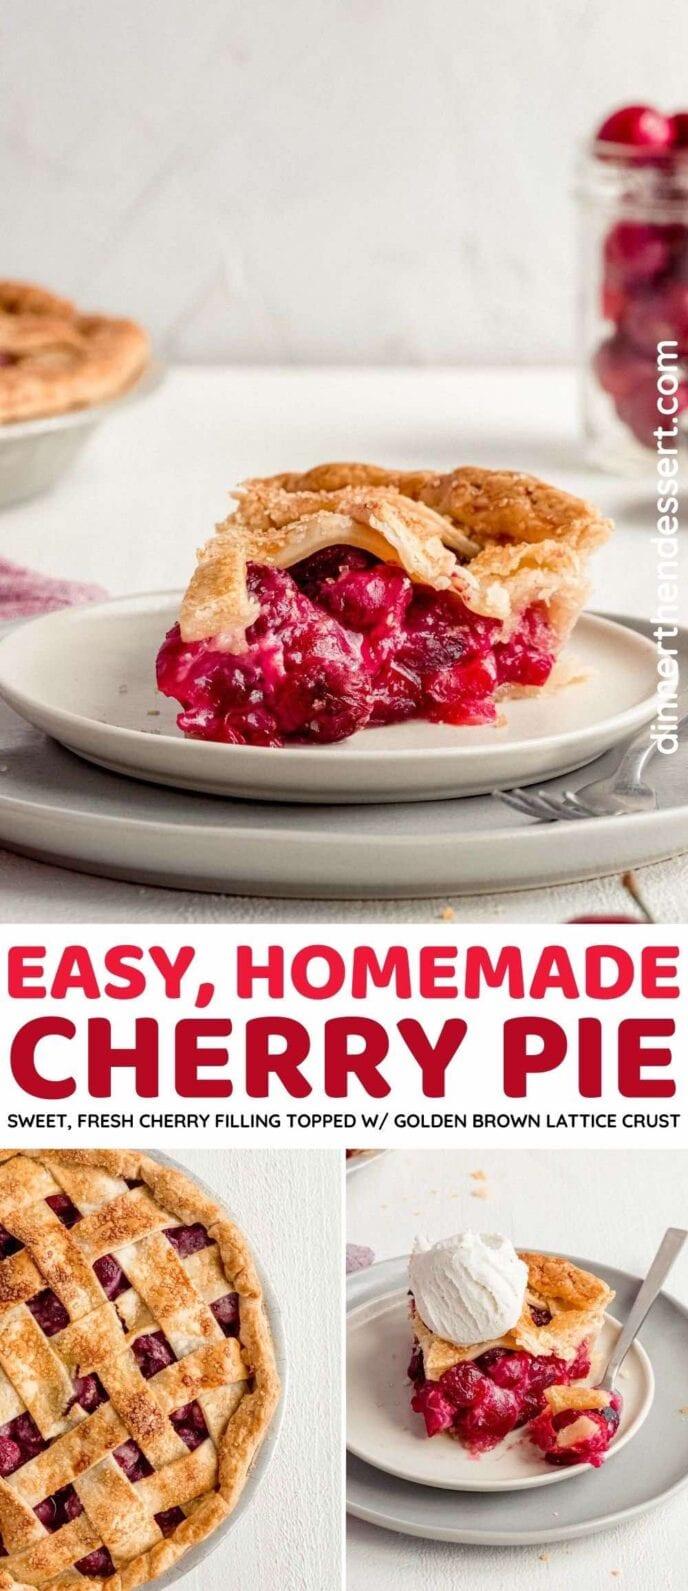 Homemade Cherry Pie collage